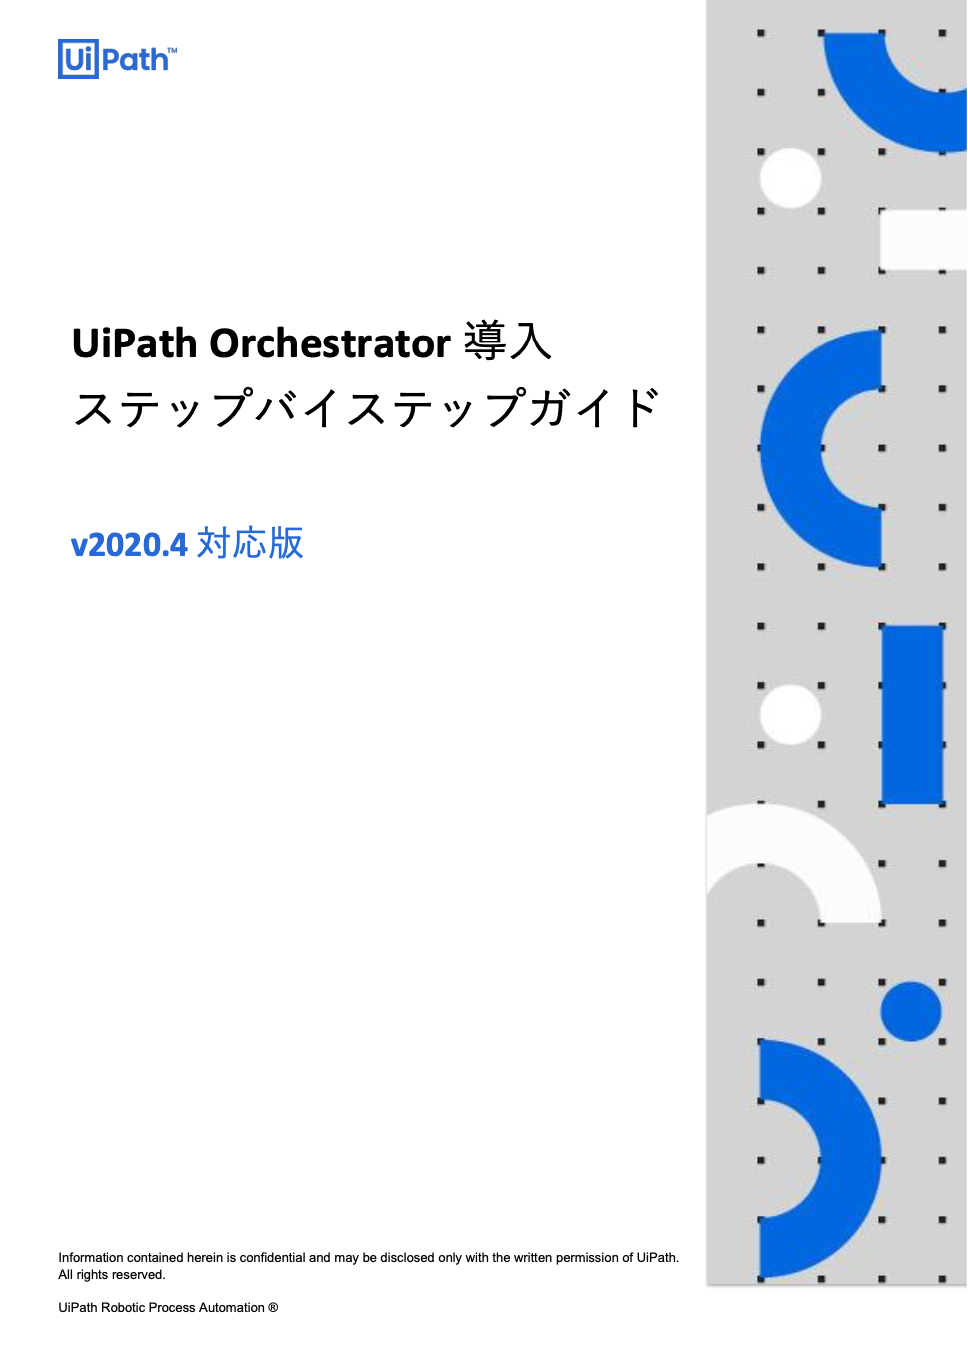 UiPathOrchestrator2020.4_InstallationGuide